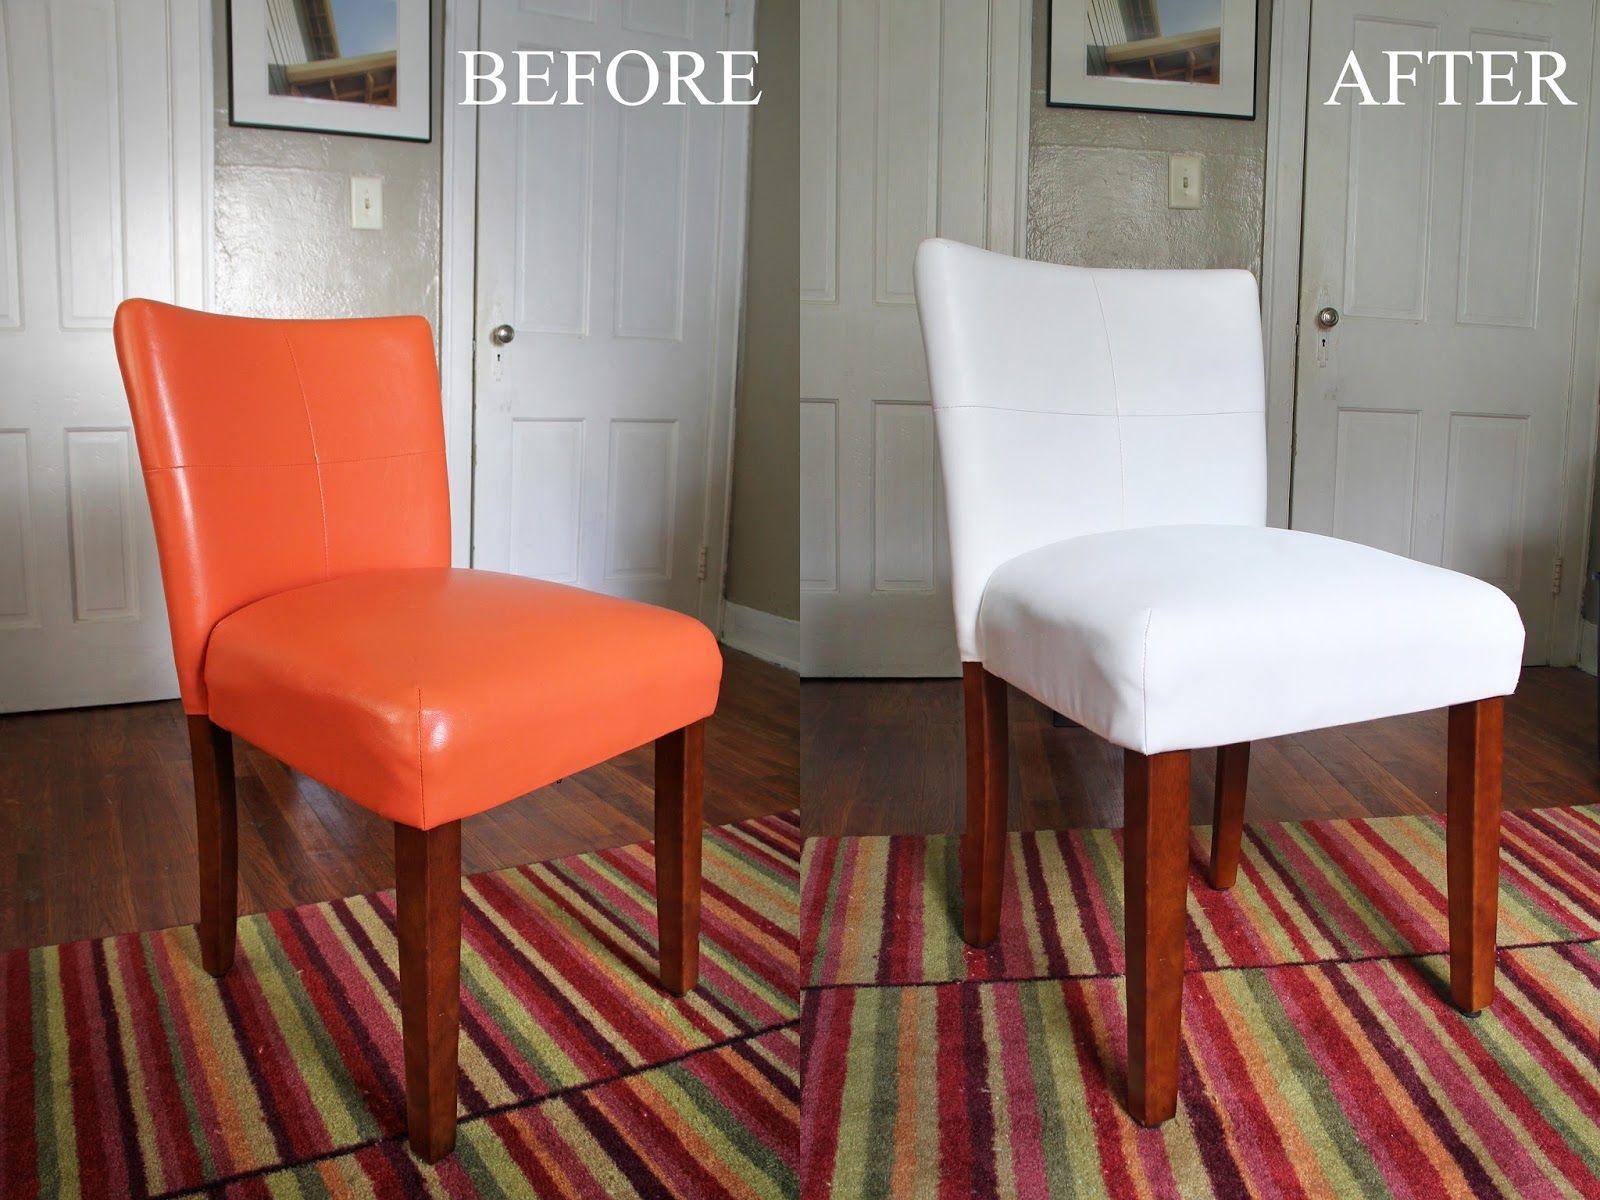 Diy Painted Vinyl Vinyl Chairs Painting Fabric Furniture Furniture